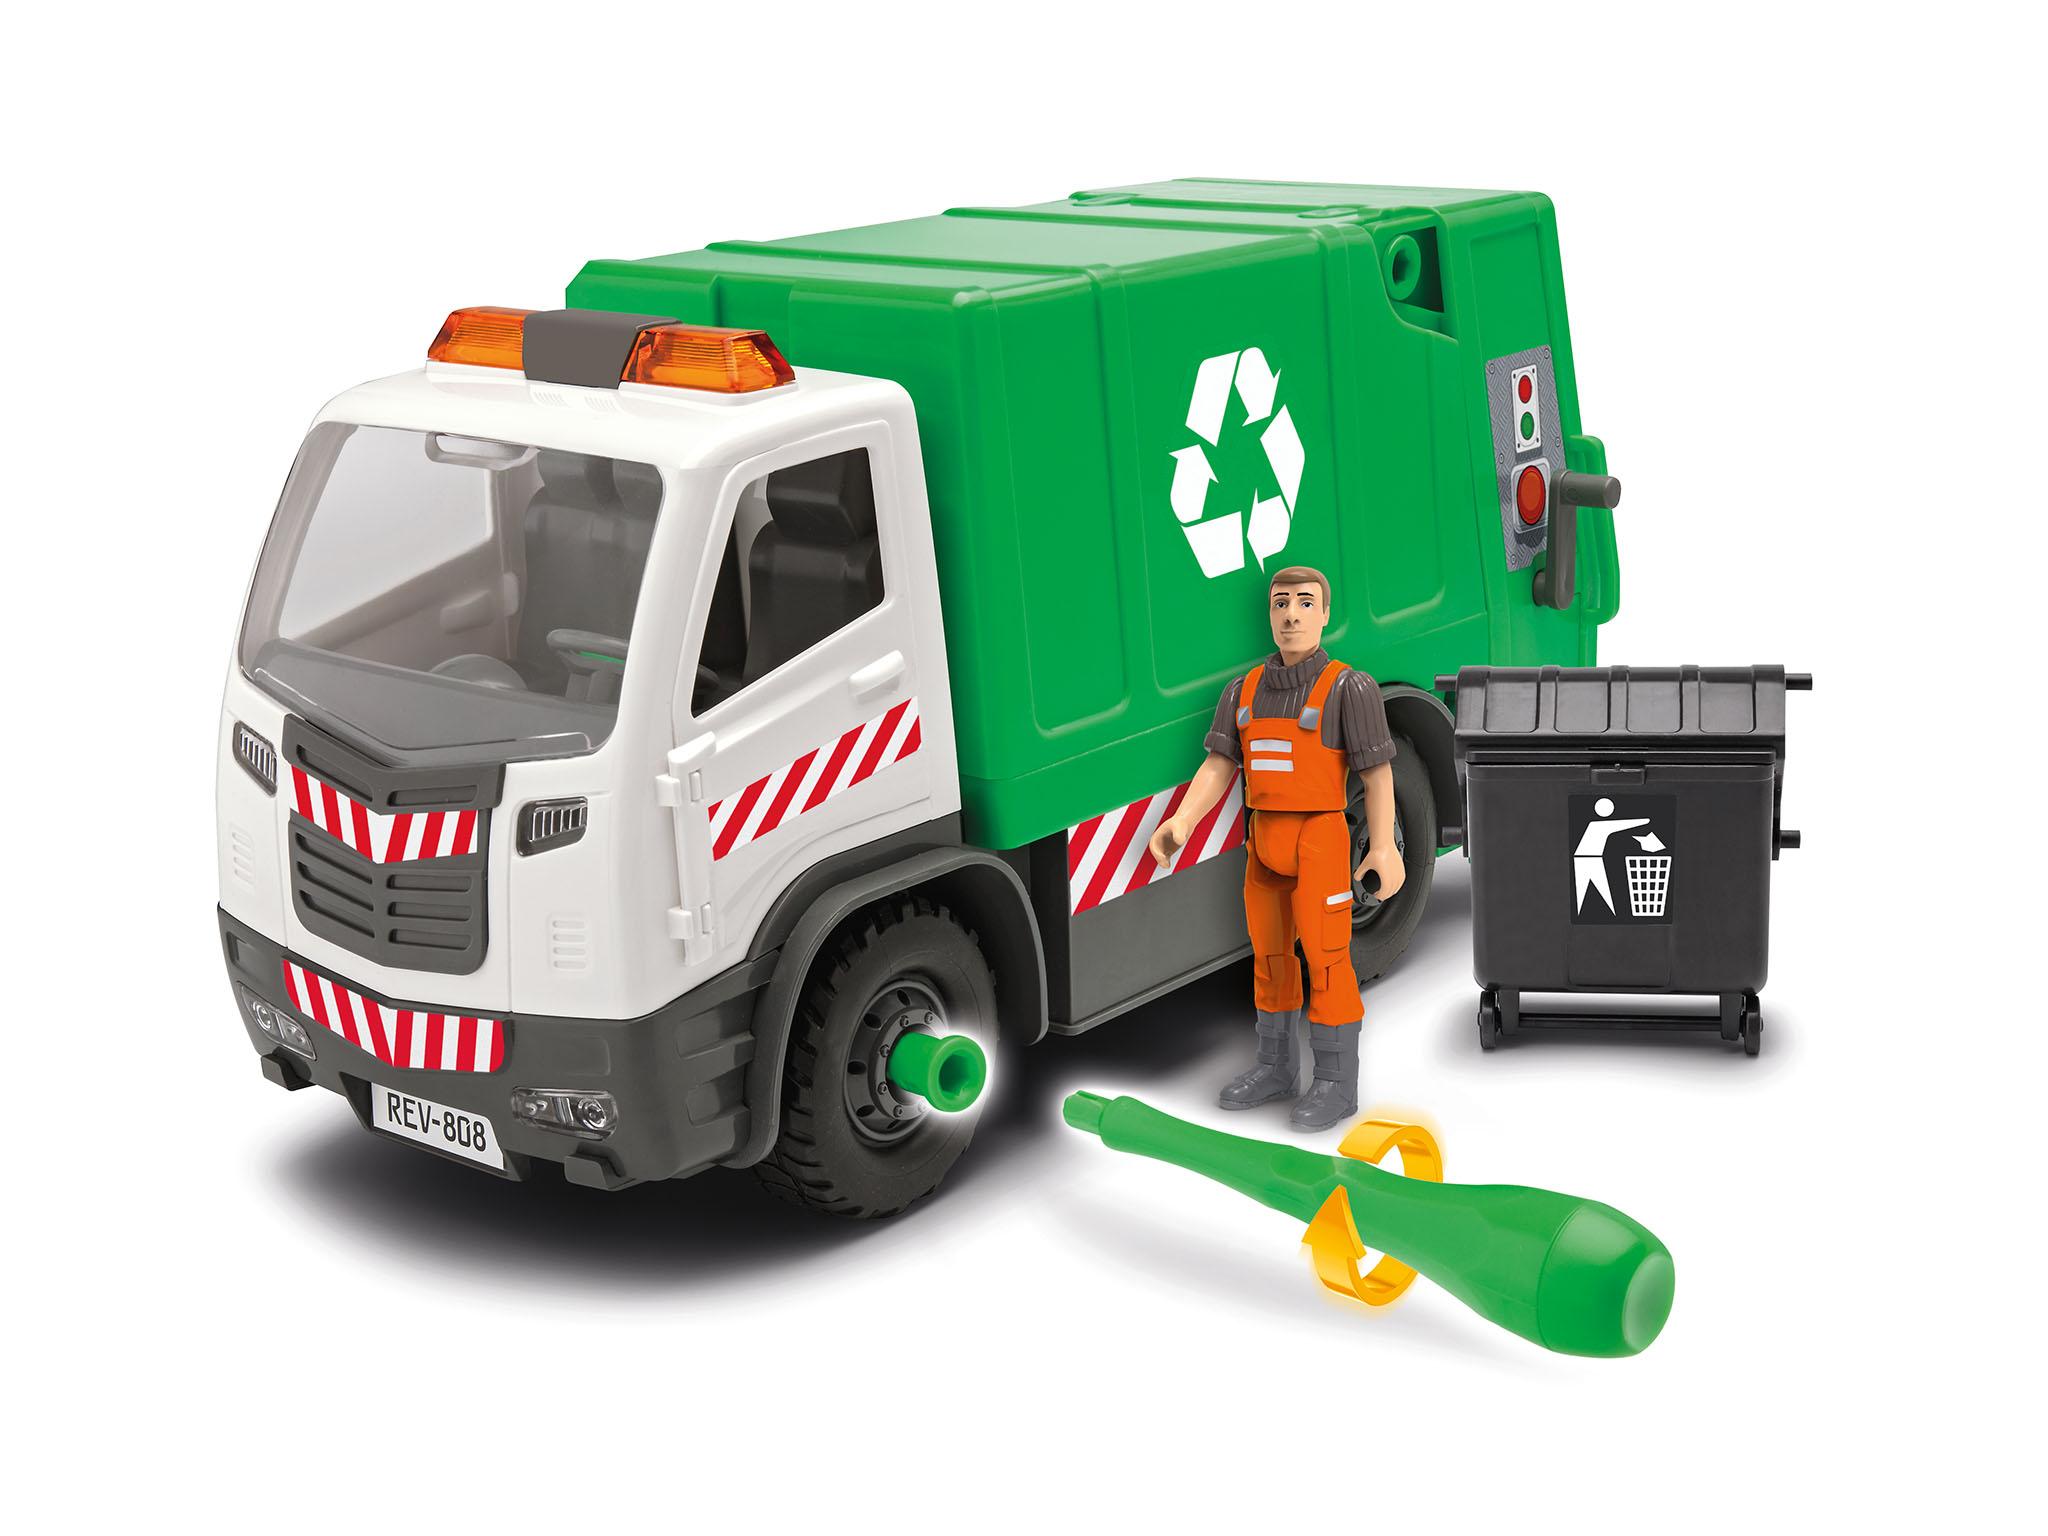 REVELL Garbage Truck Bau- & Konstruktionsspielzeug-Sets